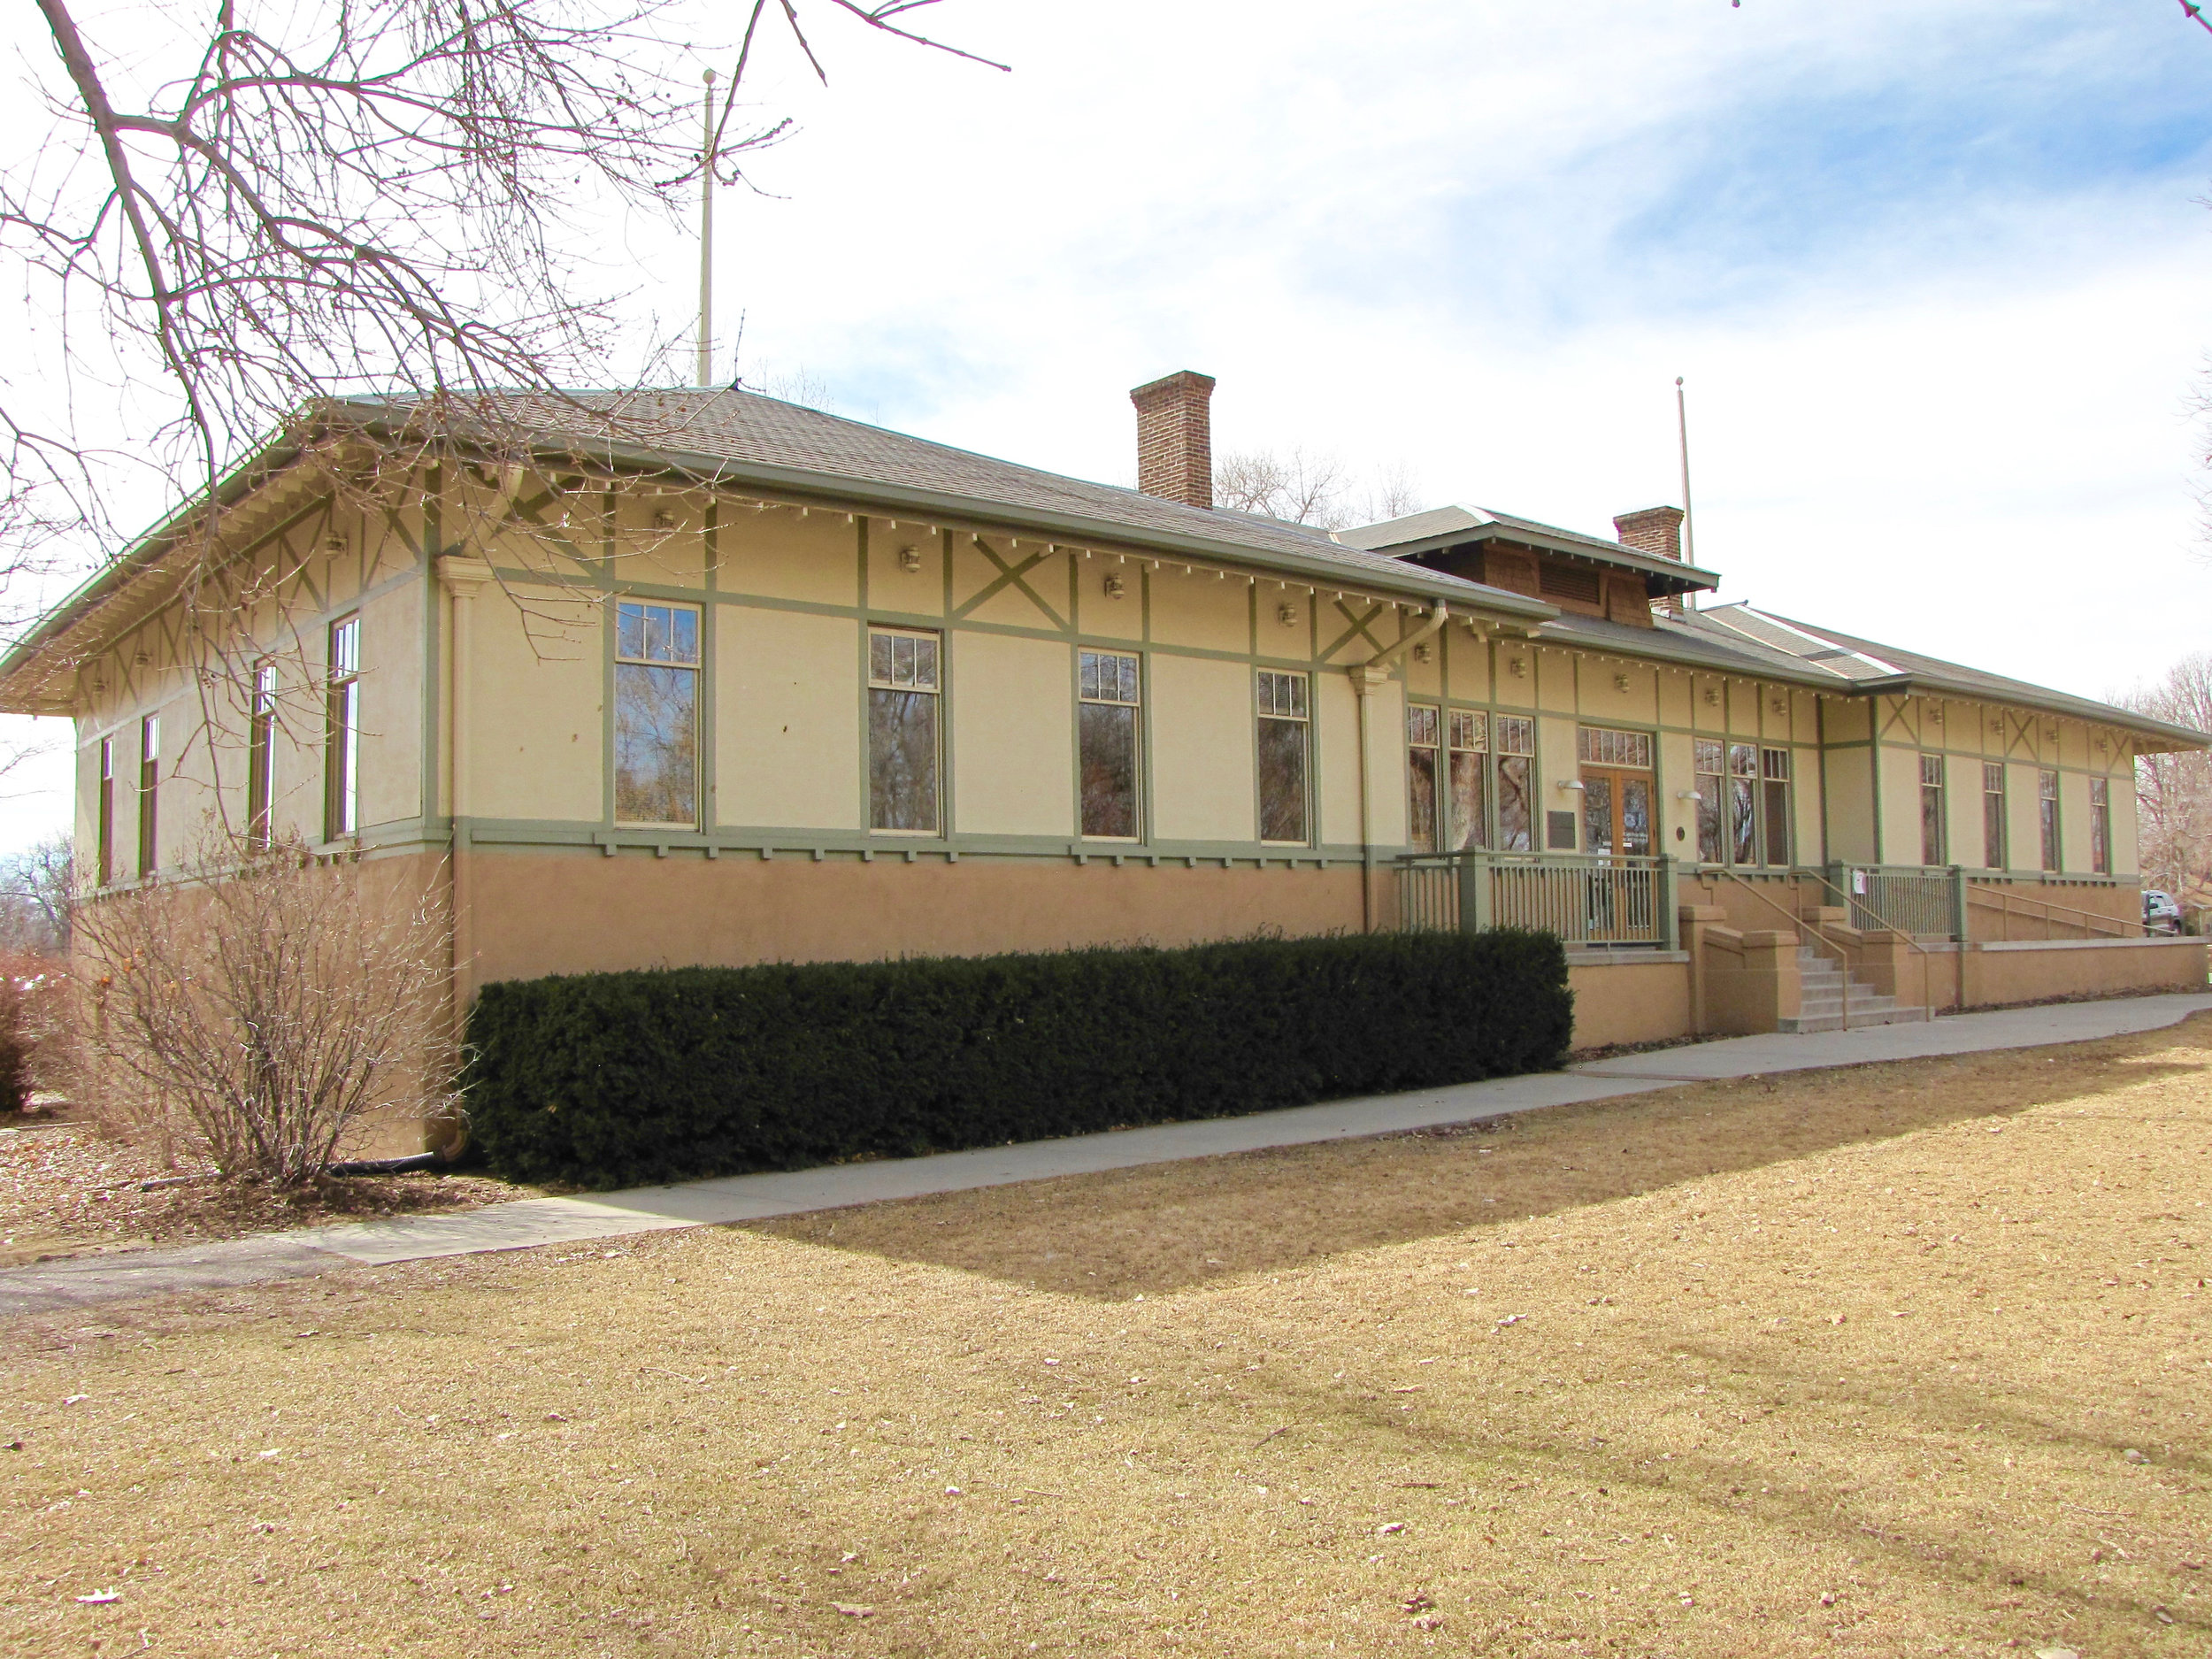 Dos Chappell Bathhouse-Washington Park, Denver